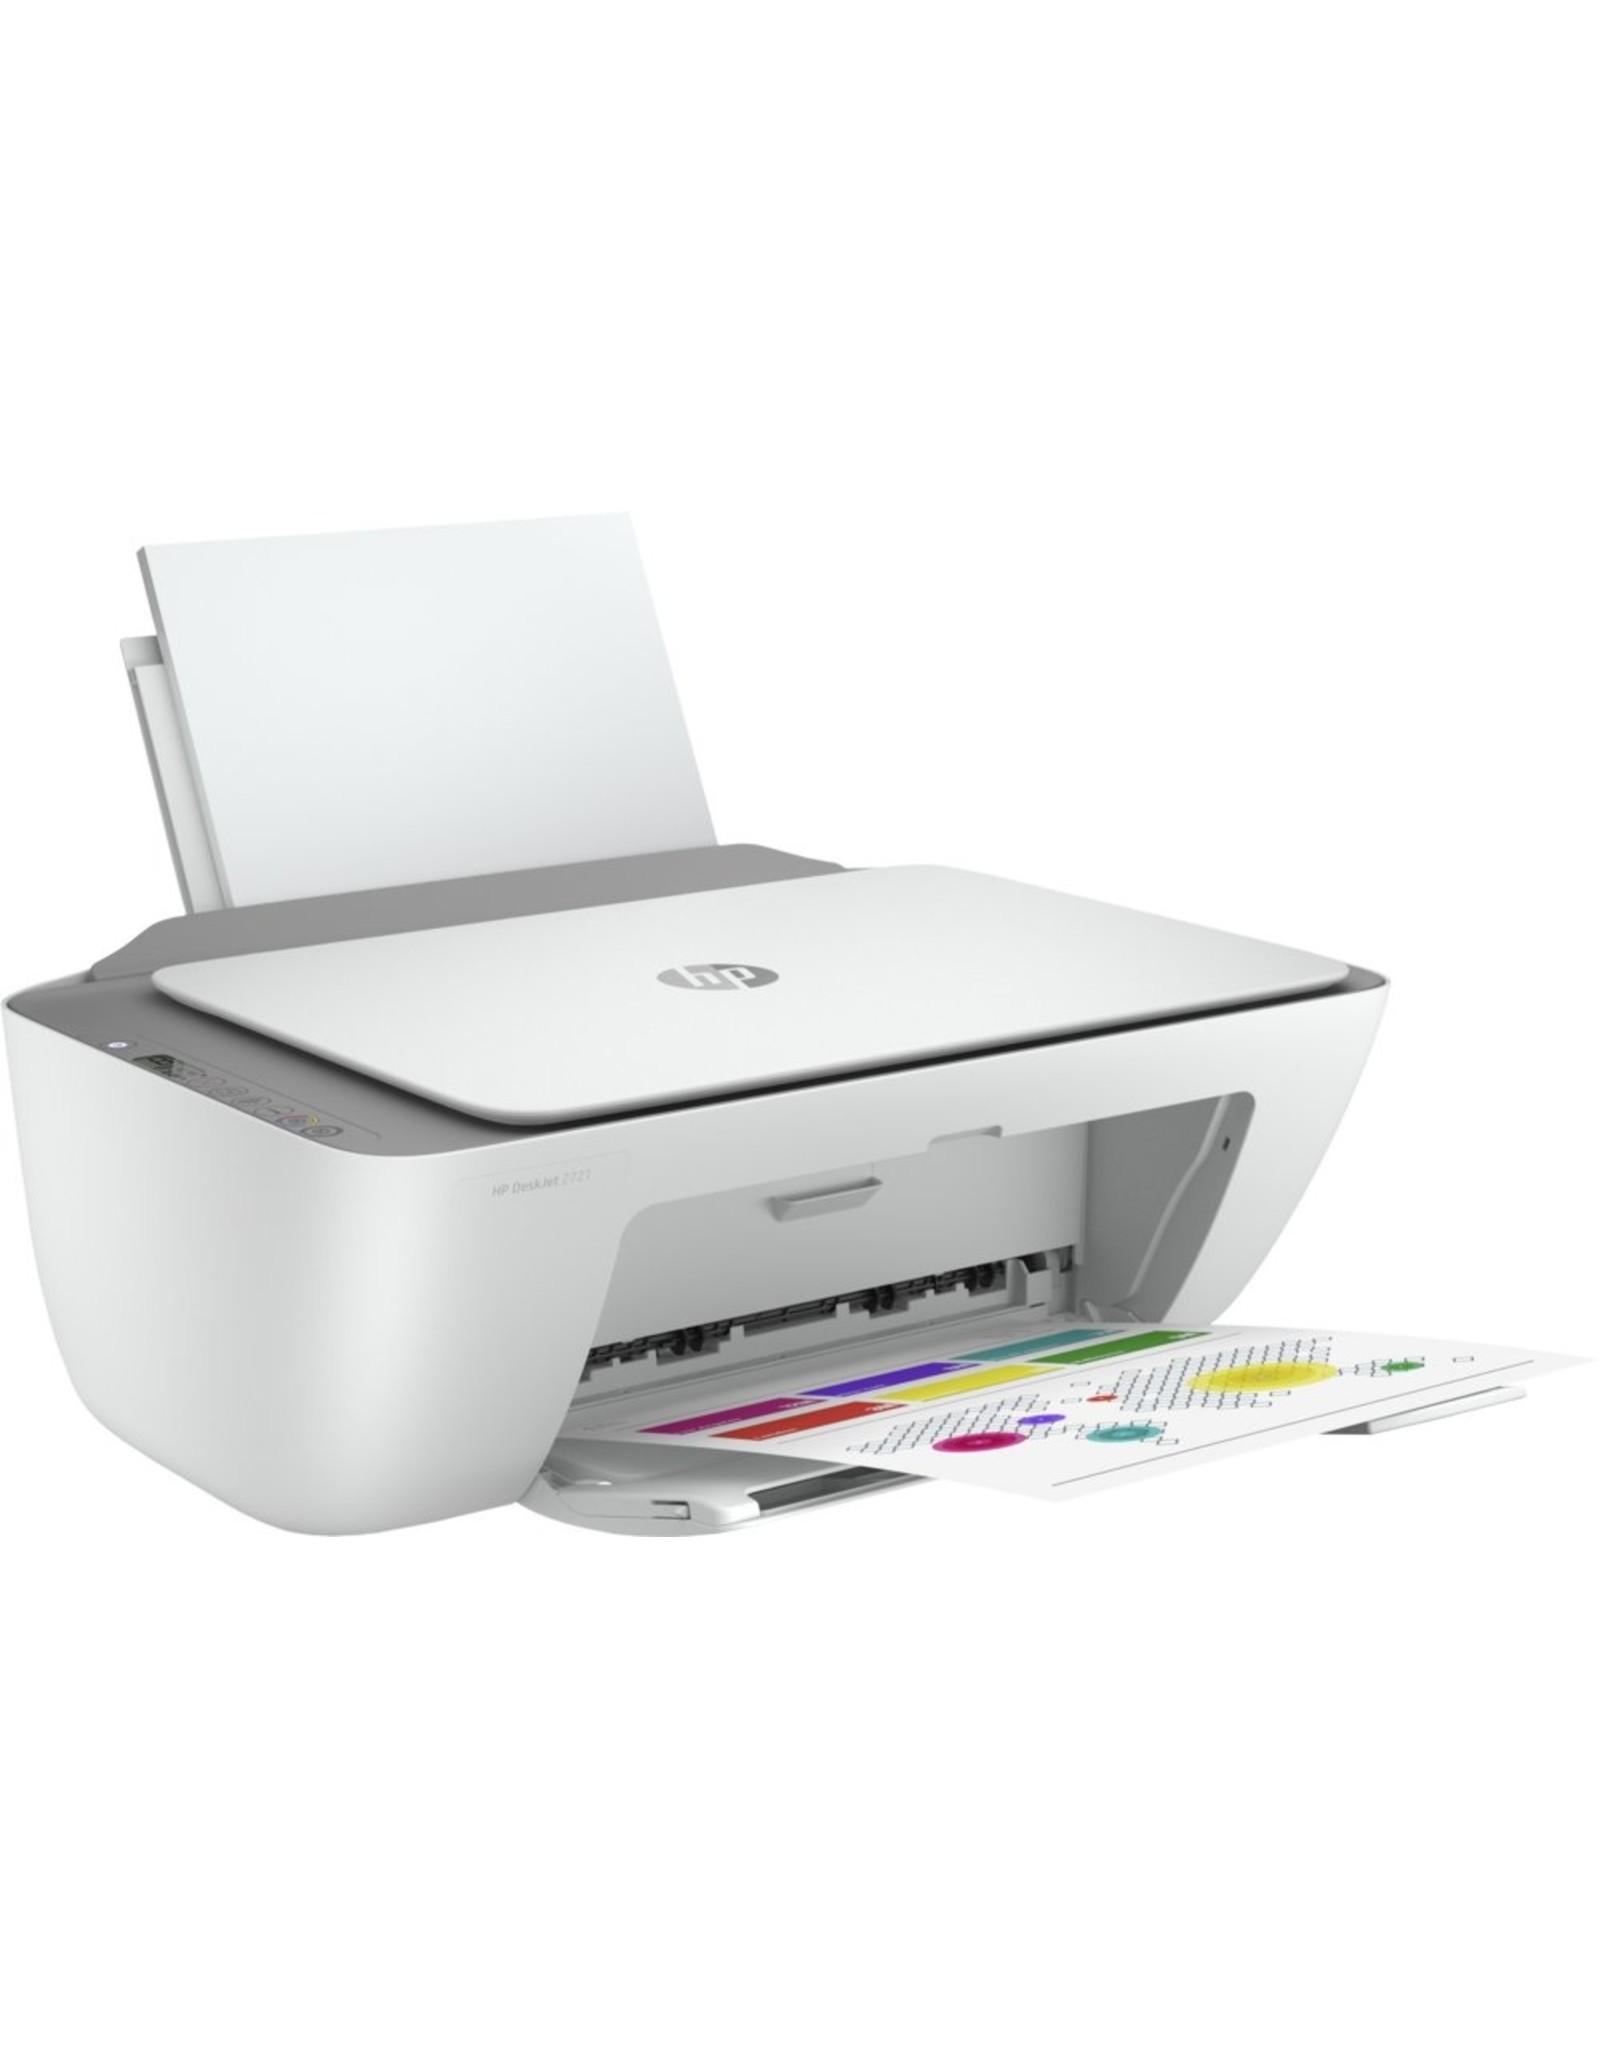 Hewlett Packard HP Deskjet Printer 2721 AiO / Color / WiFi